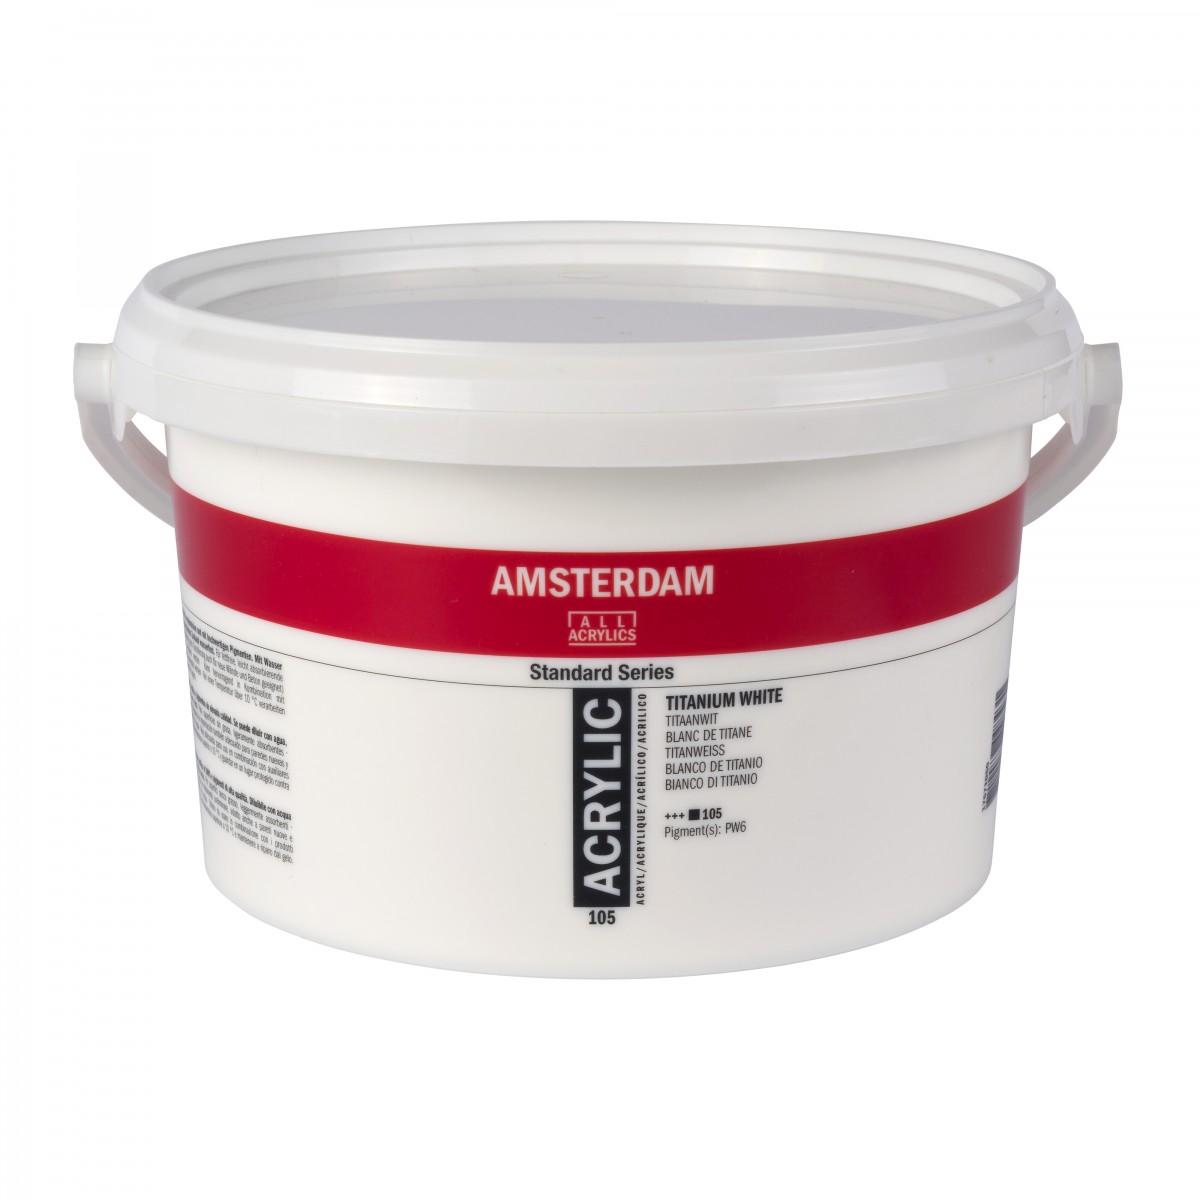 Amsterdam akrylmaling, Titanium white, 2500 ml.